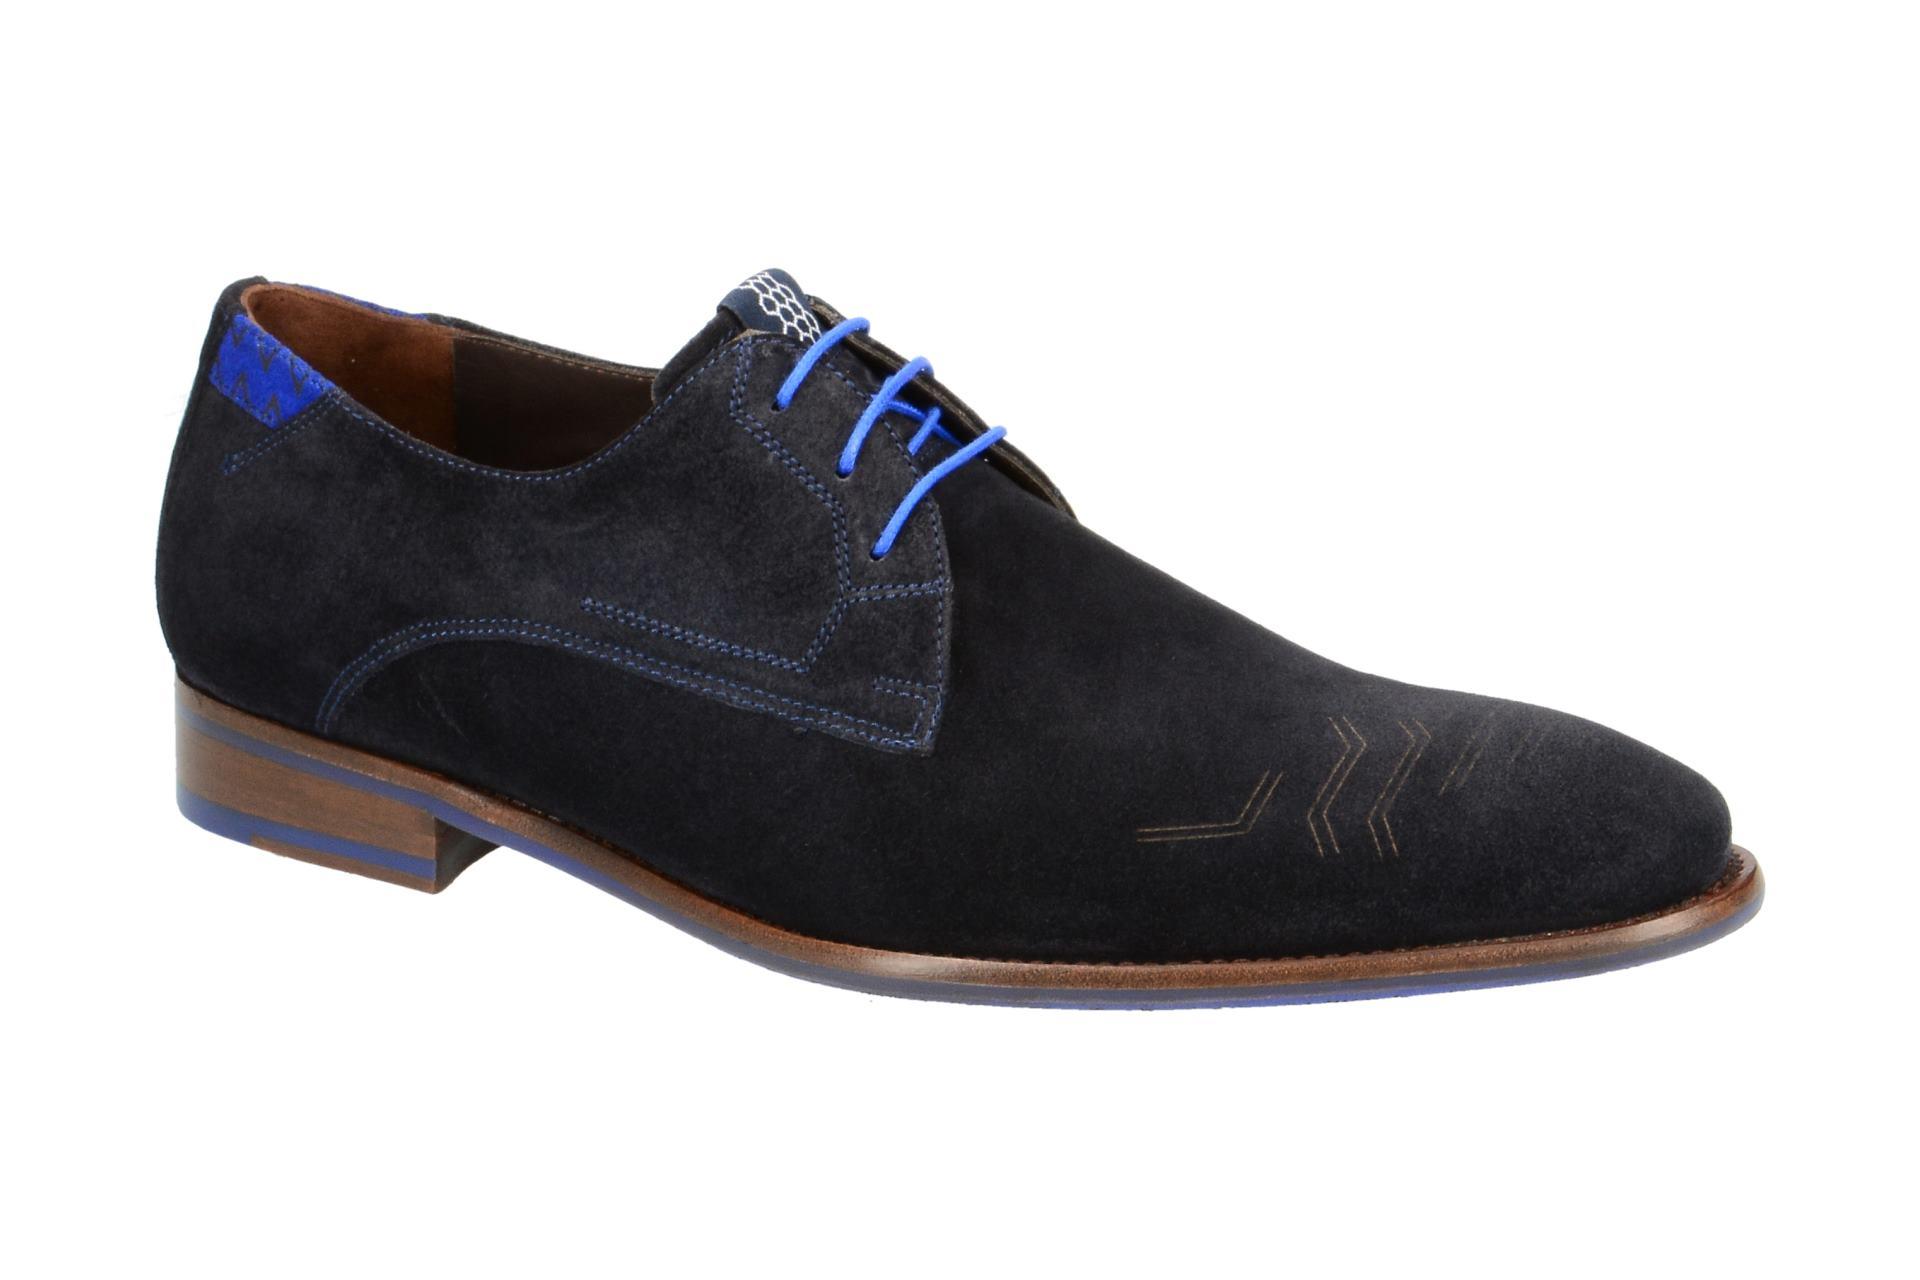 c482c205a29590 Floris van Bommel Schuhe blau 14092 - Schuhhaus Strauch Shop